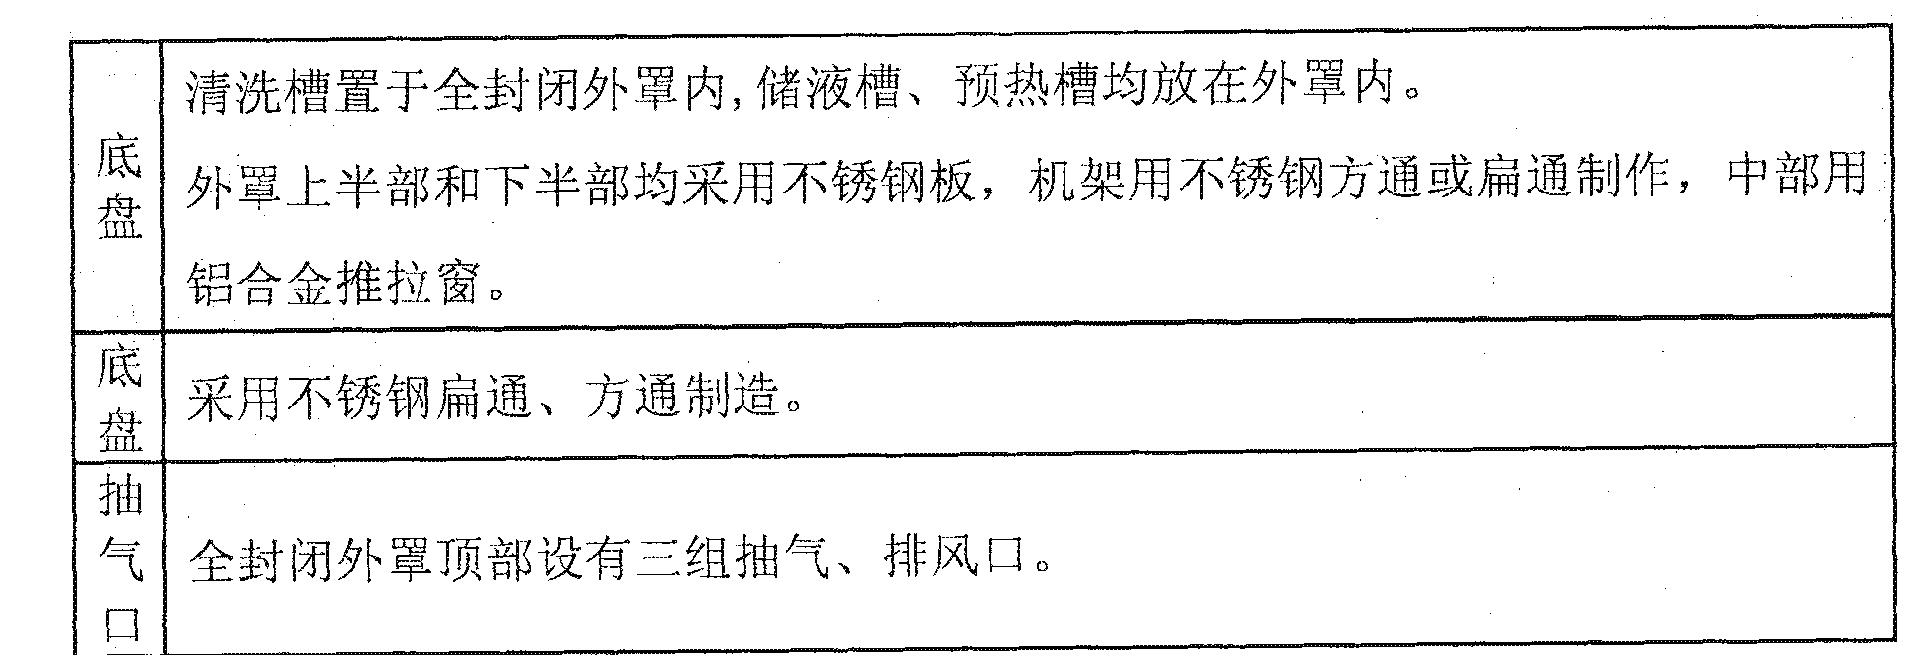 Figure CN204035120UD00141